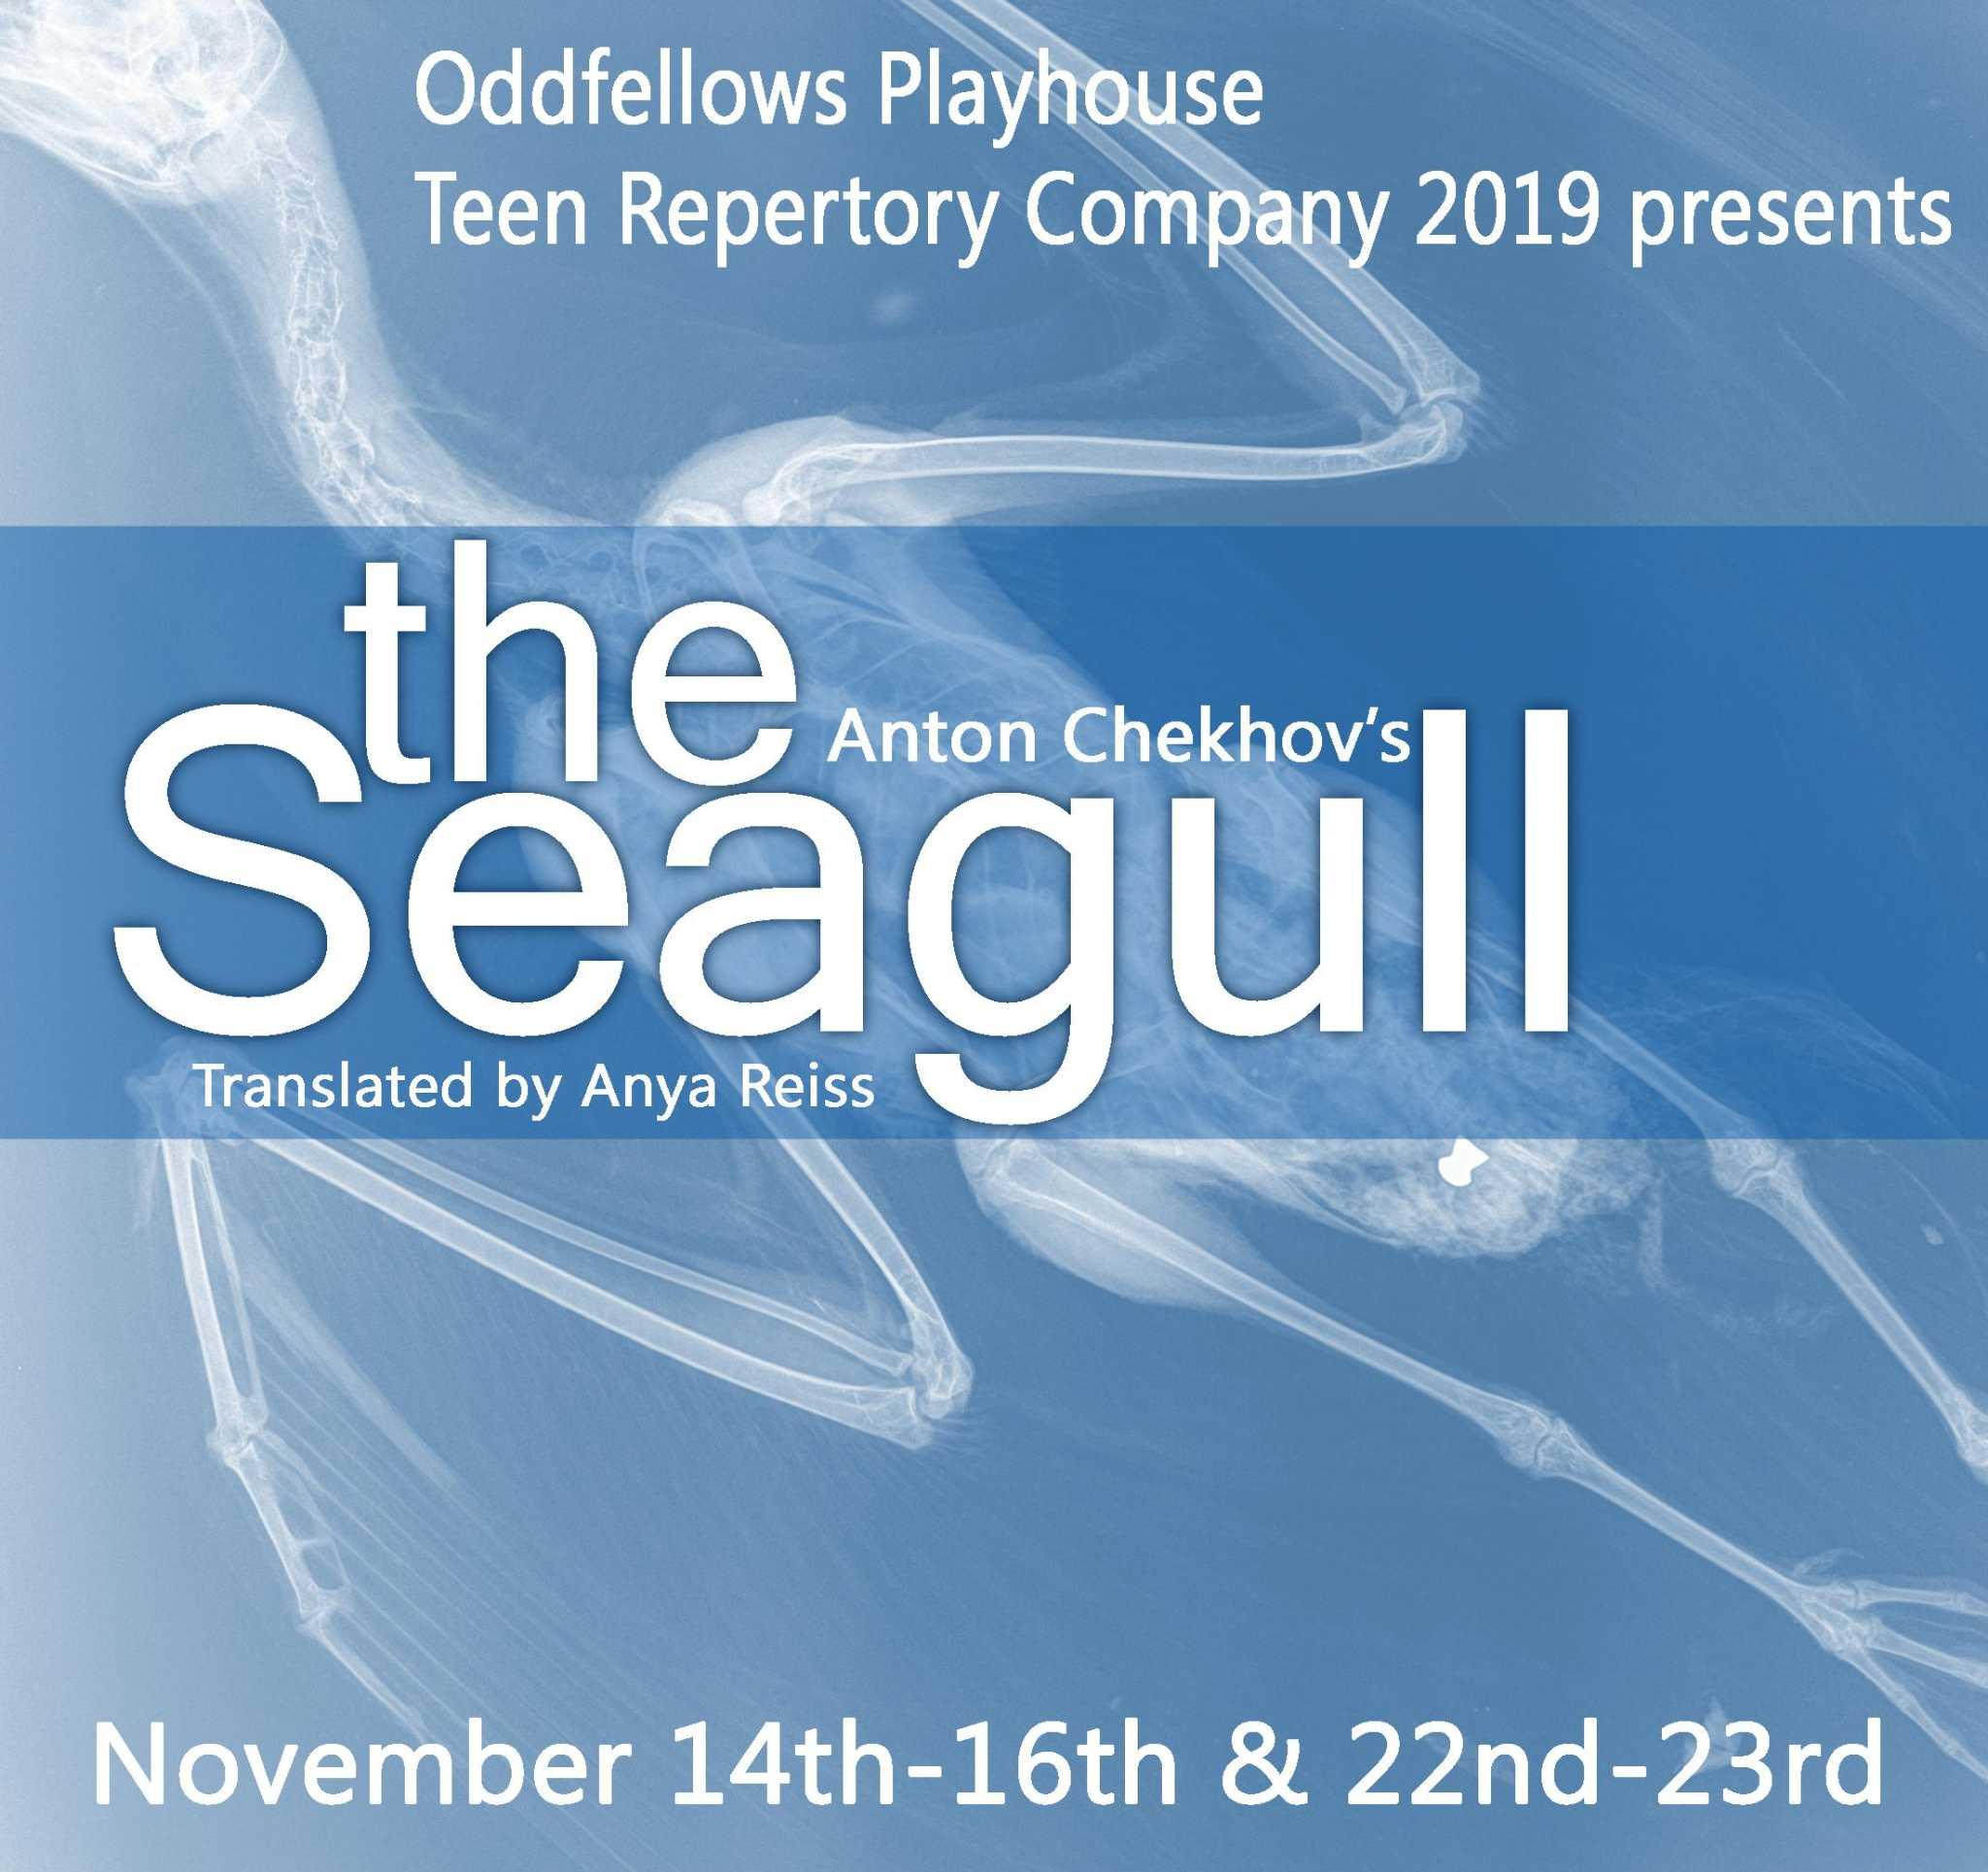 Oddfellows Playhouse teen company presents Chekhov's 'The Seagull' - Middletown Press